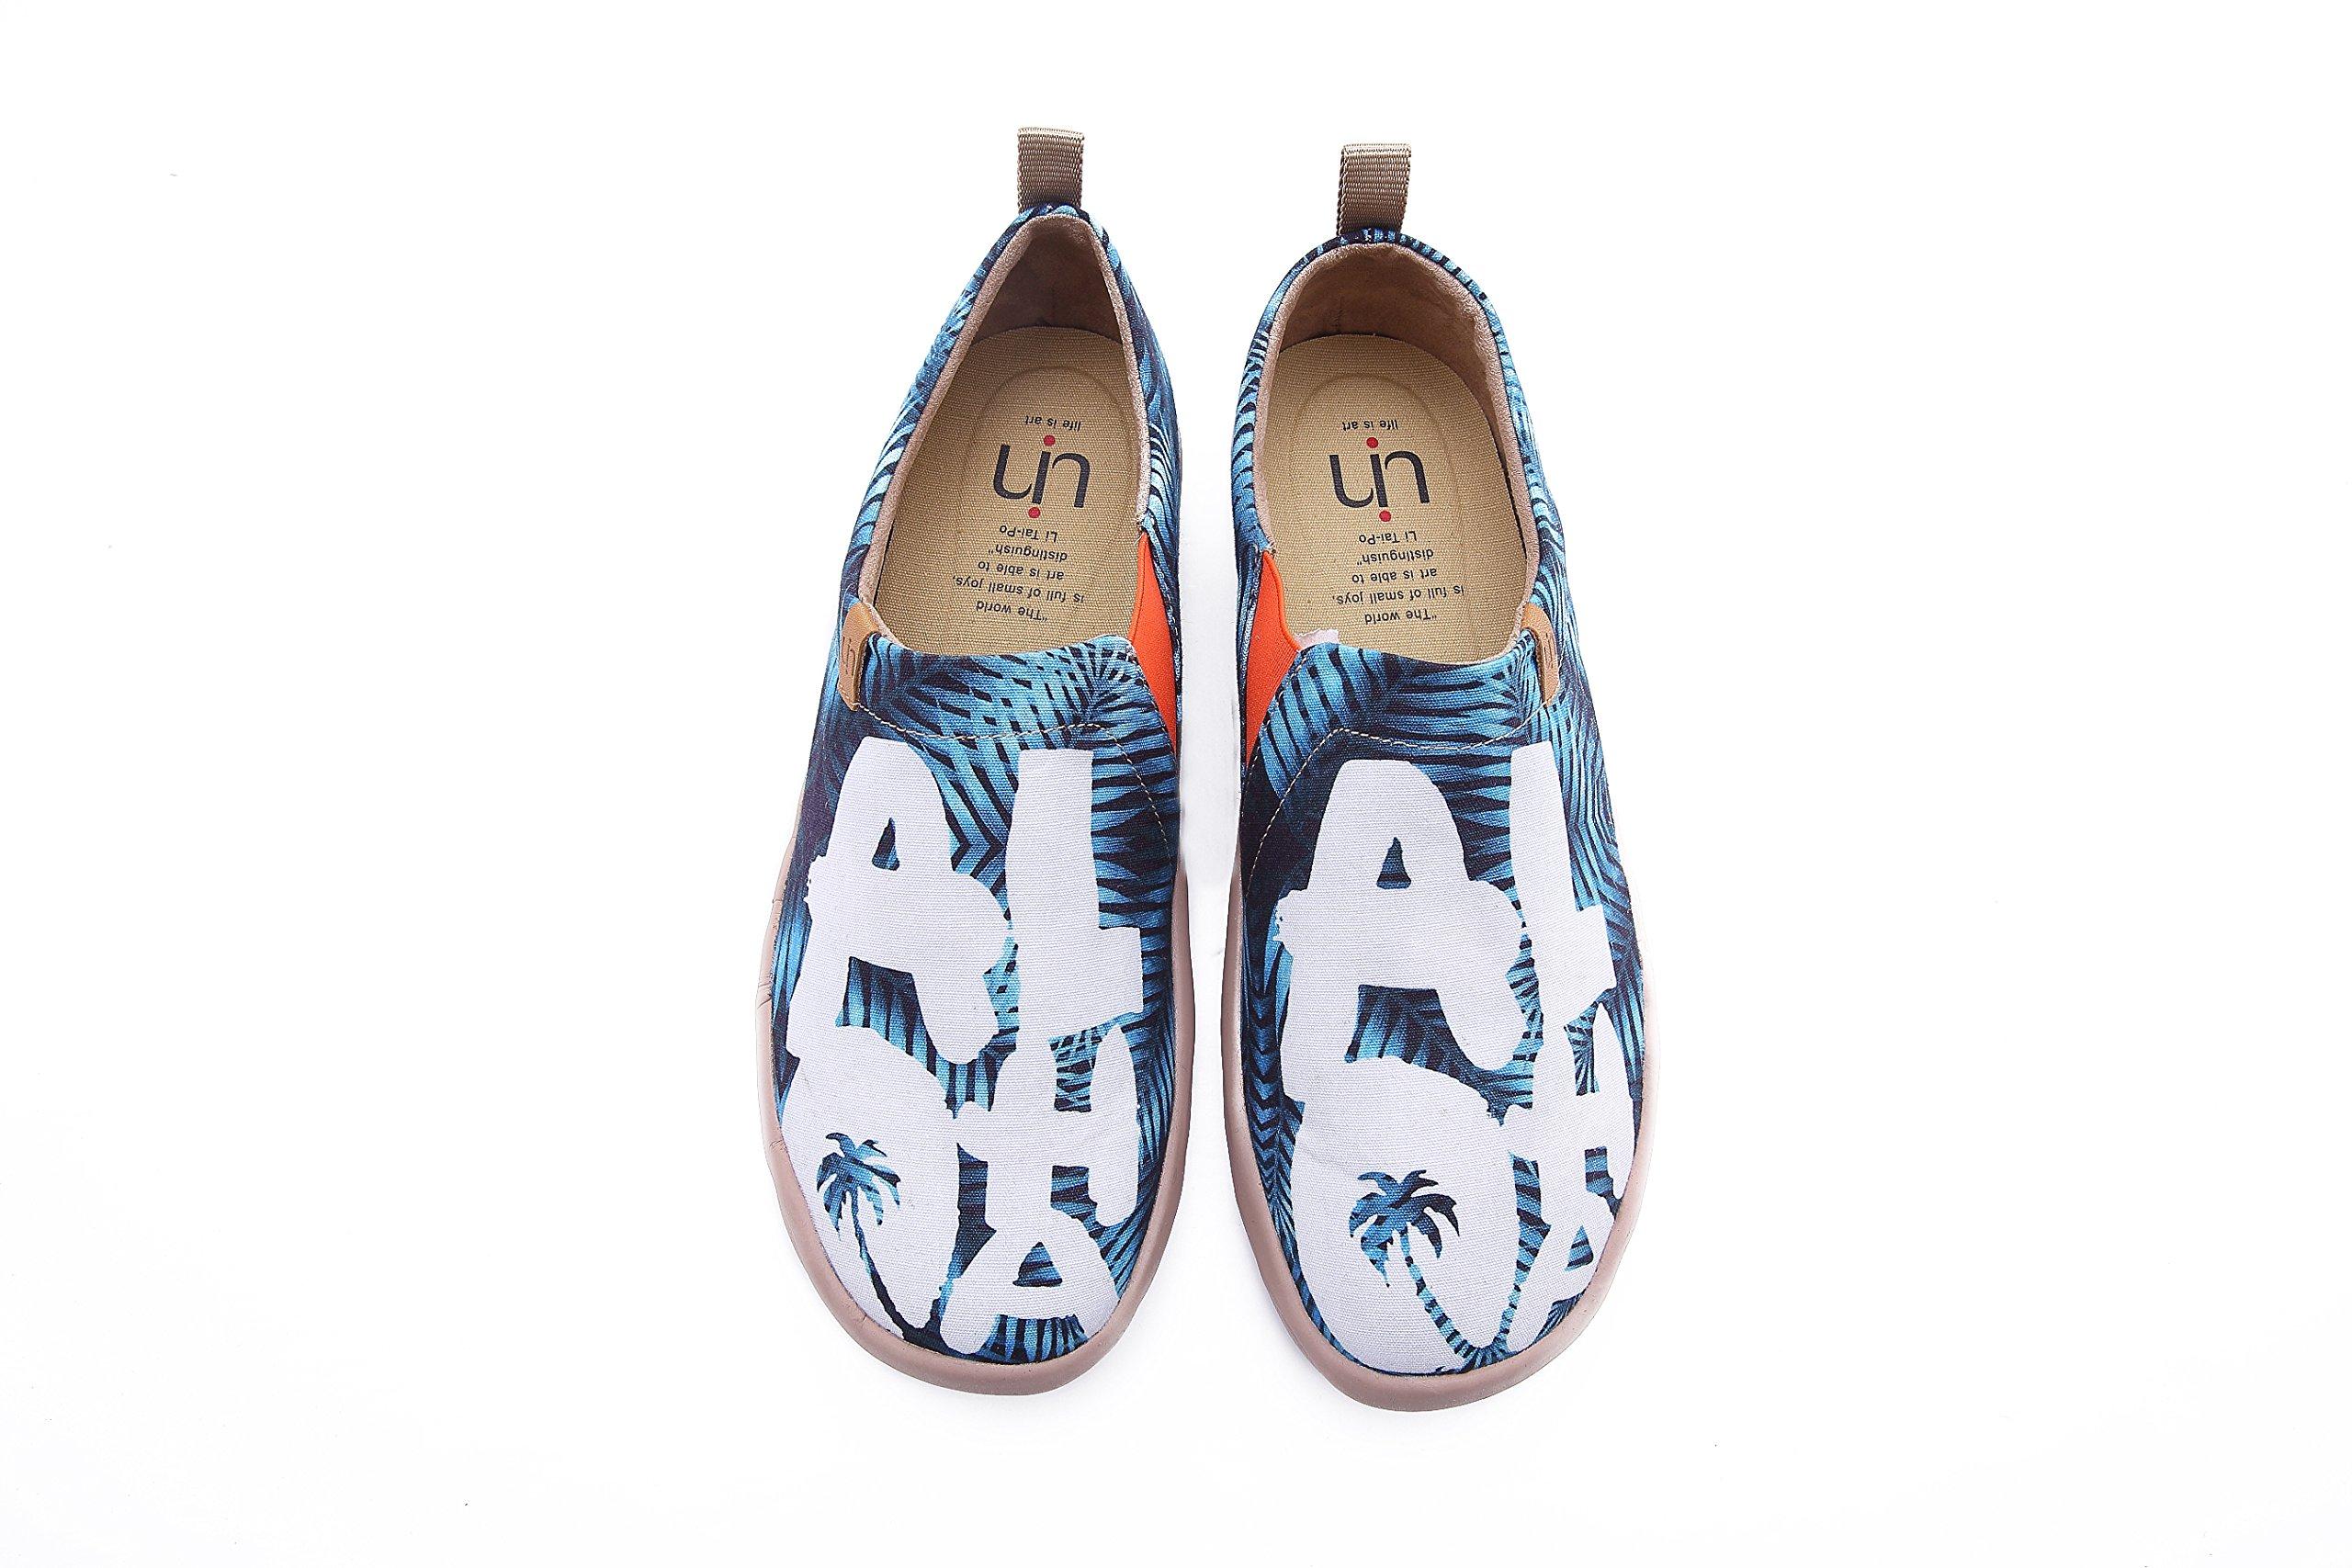 UIN Men's Aloha Canvas Travel Comfort Slip On Shoes Blue (8.5)